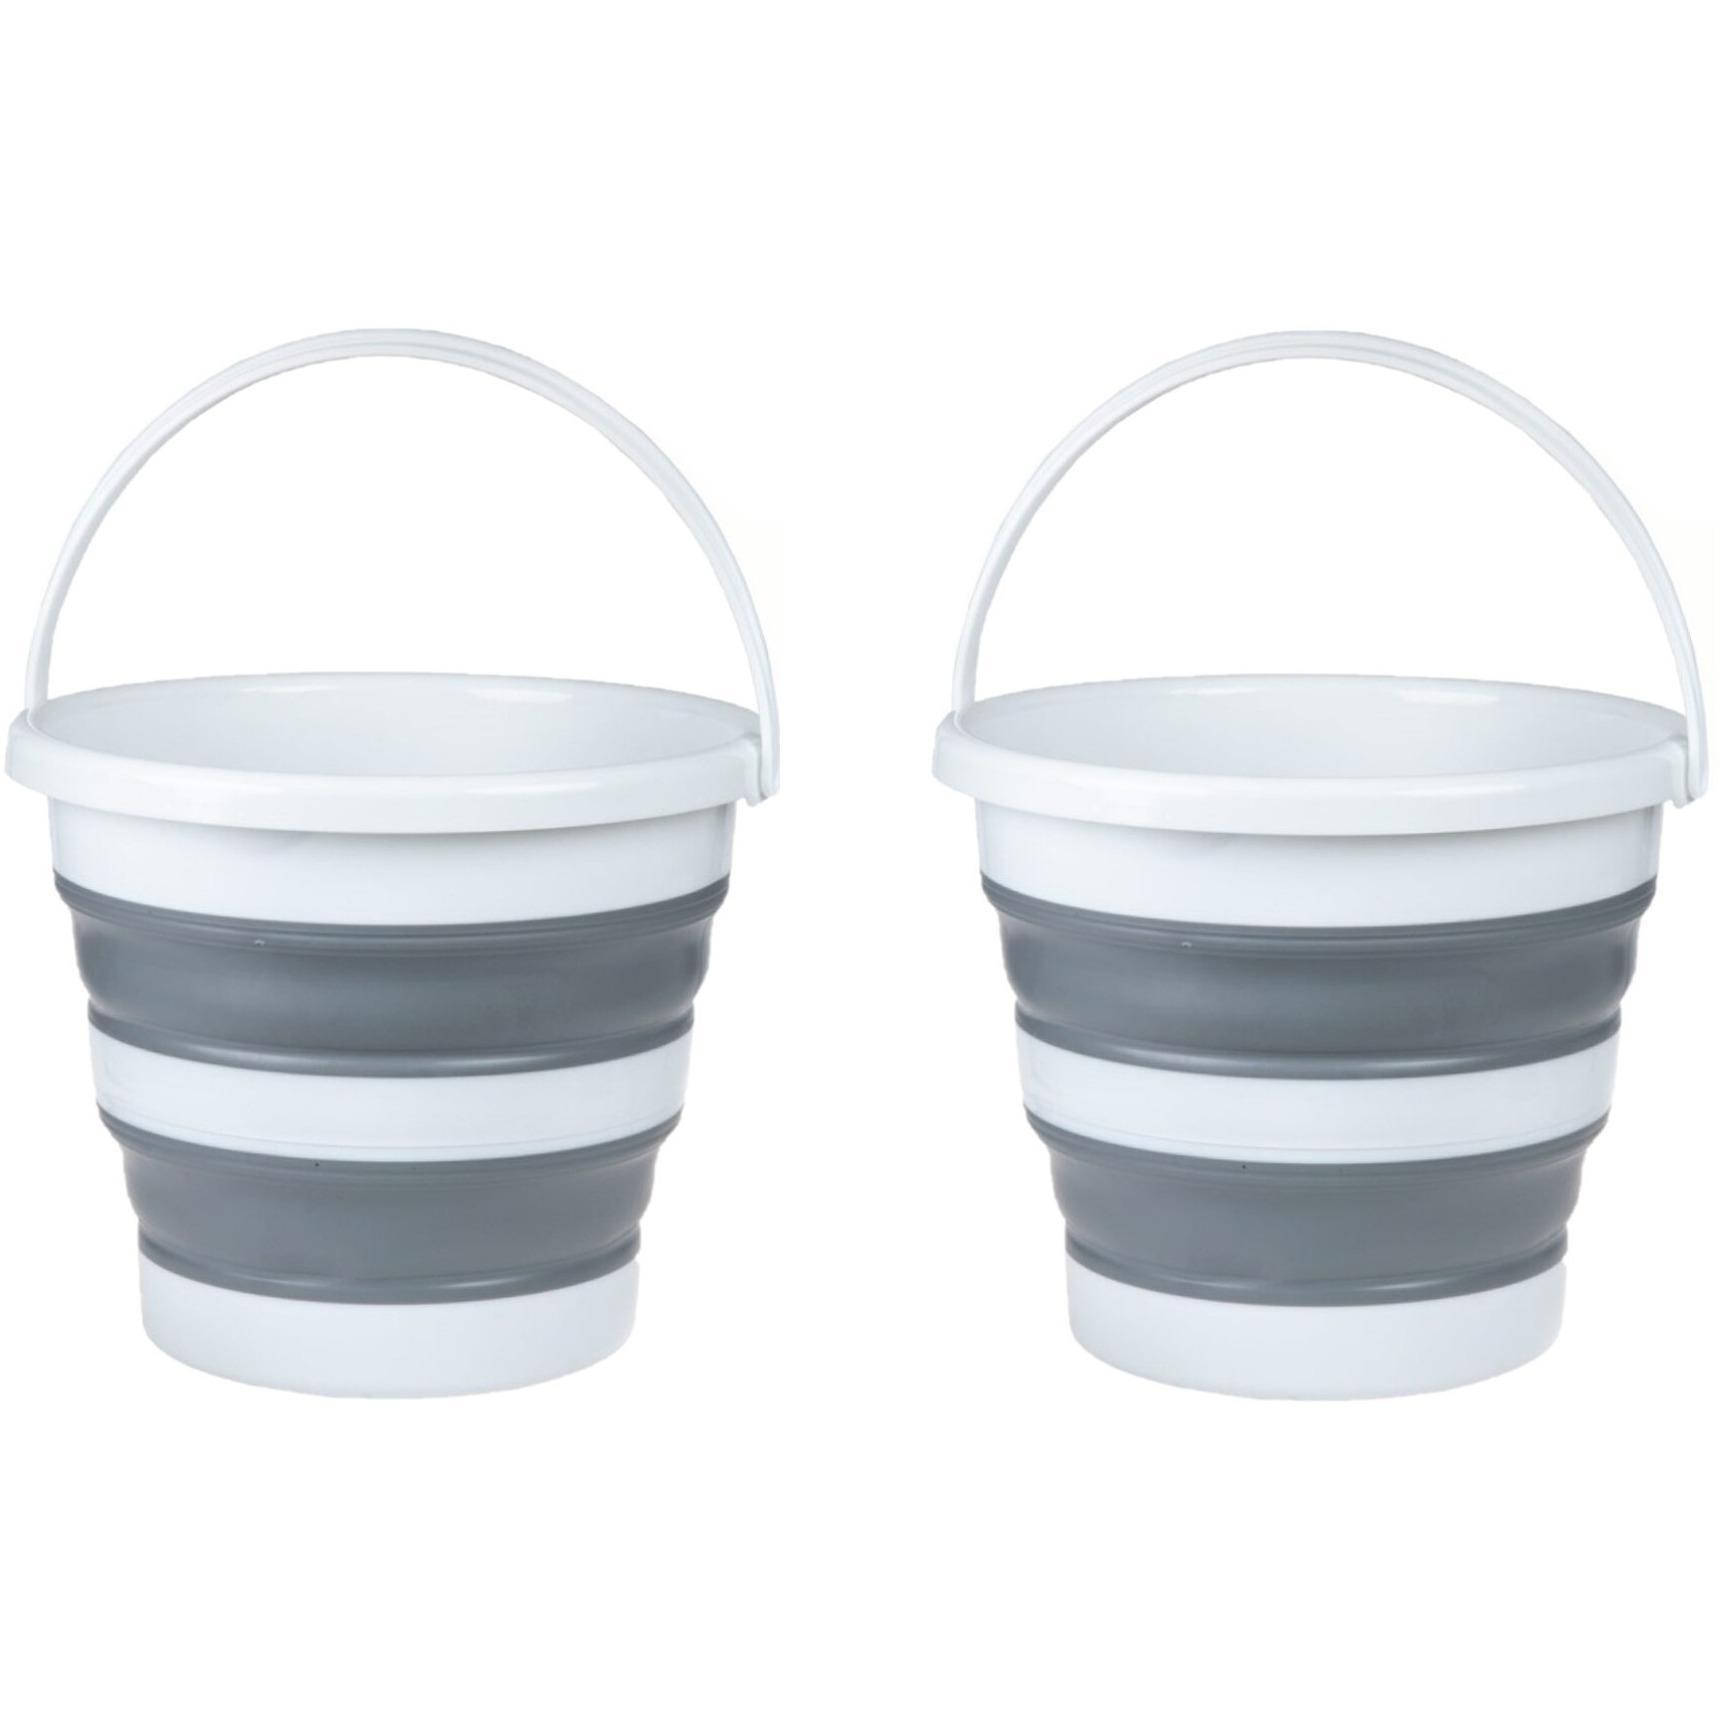 2x Stuks opvouwbare emmers wit/grijs 22 liter -